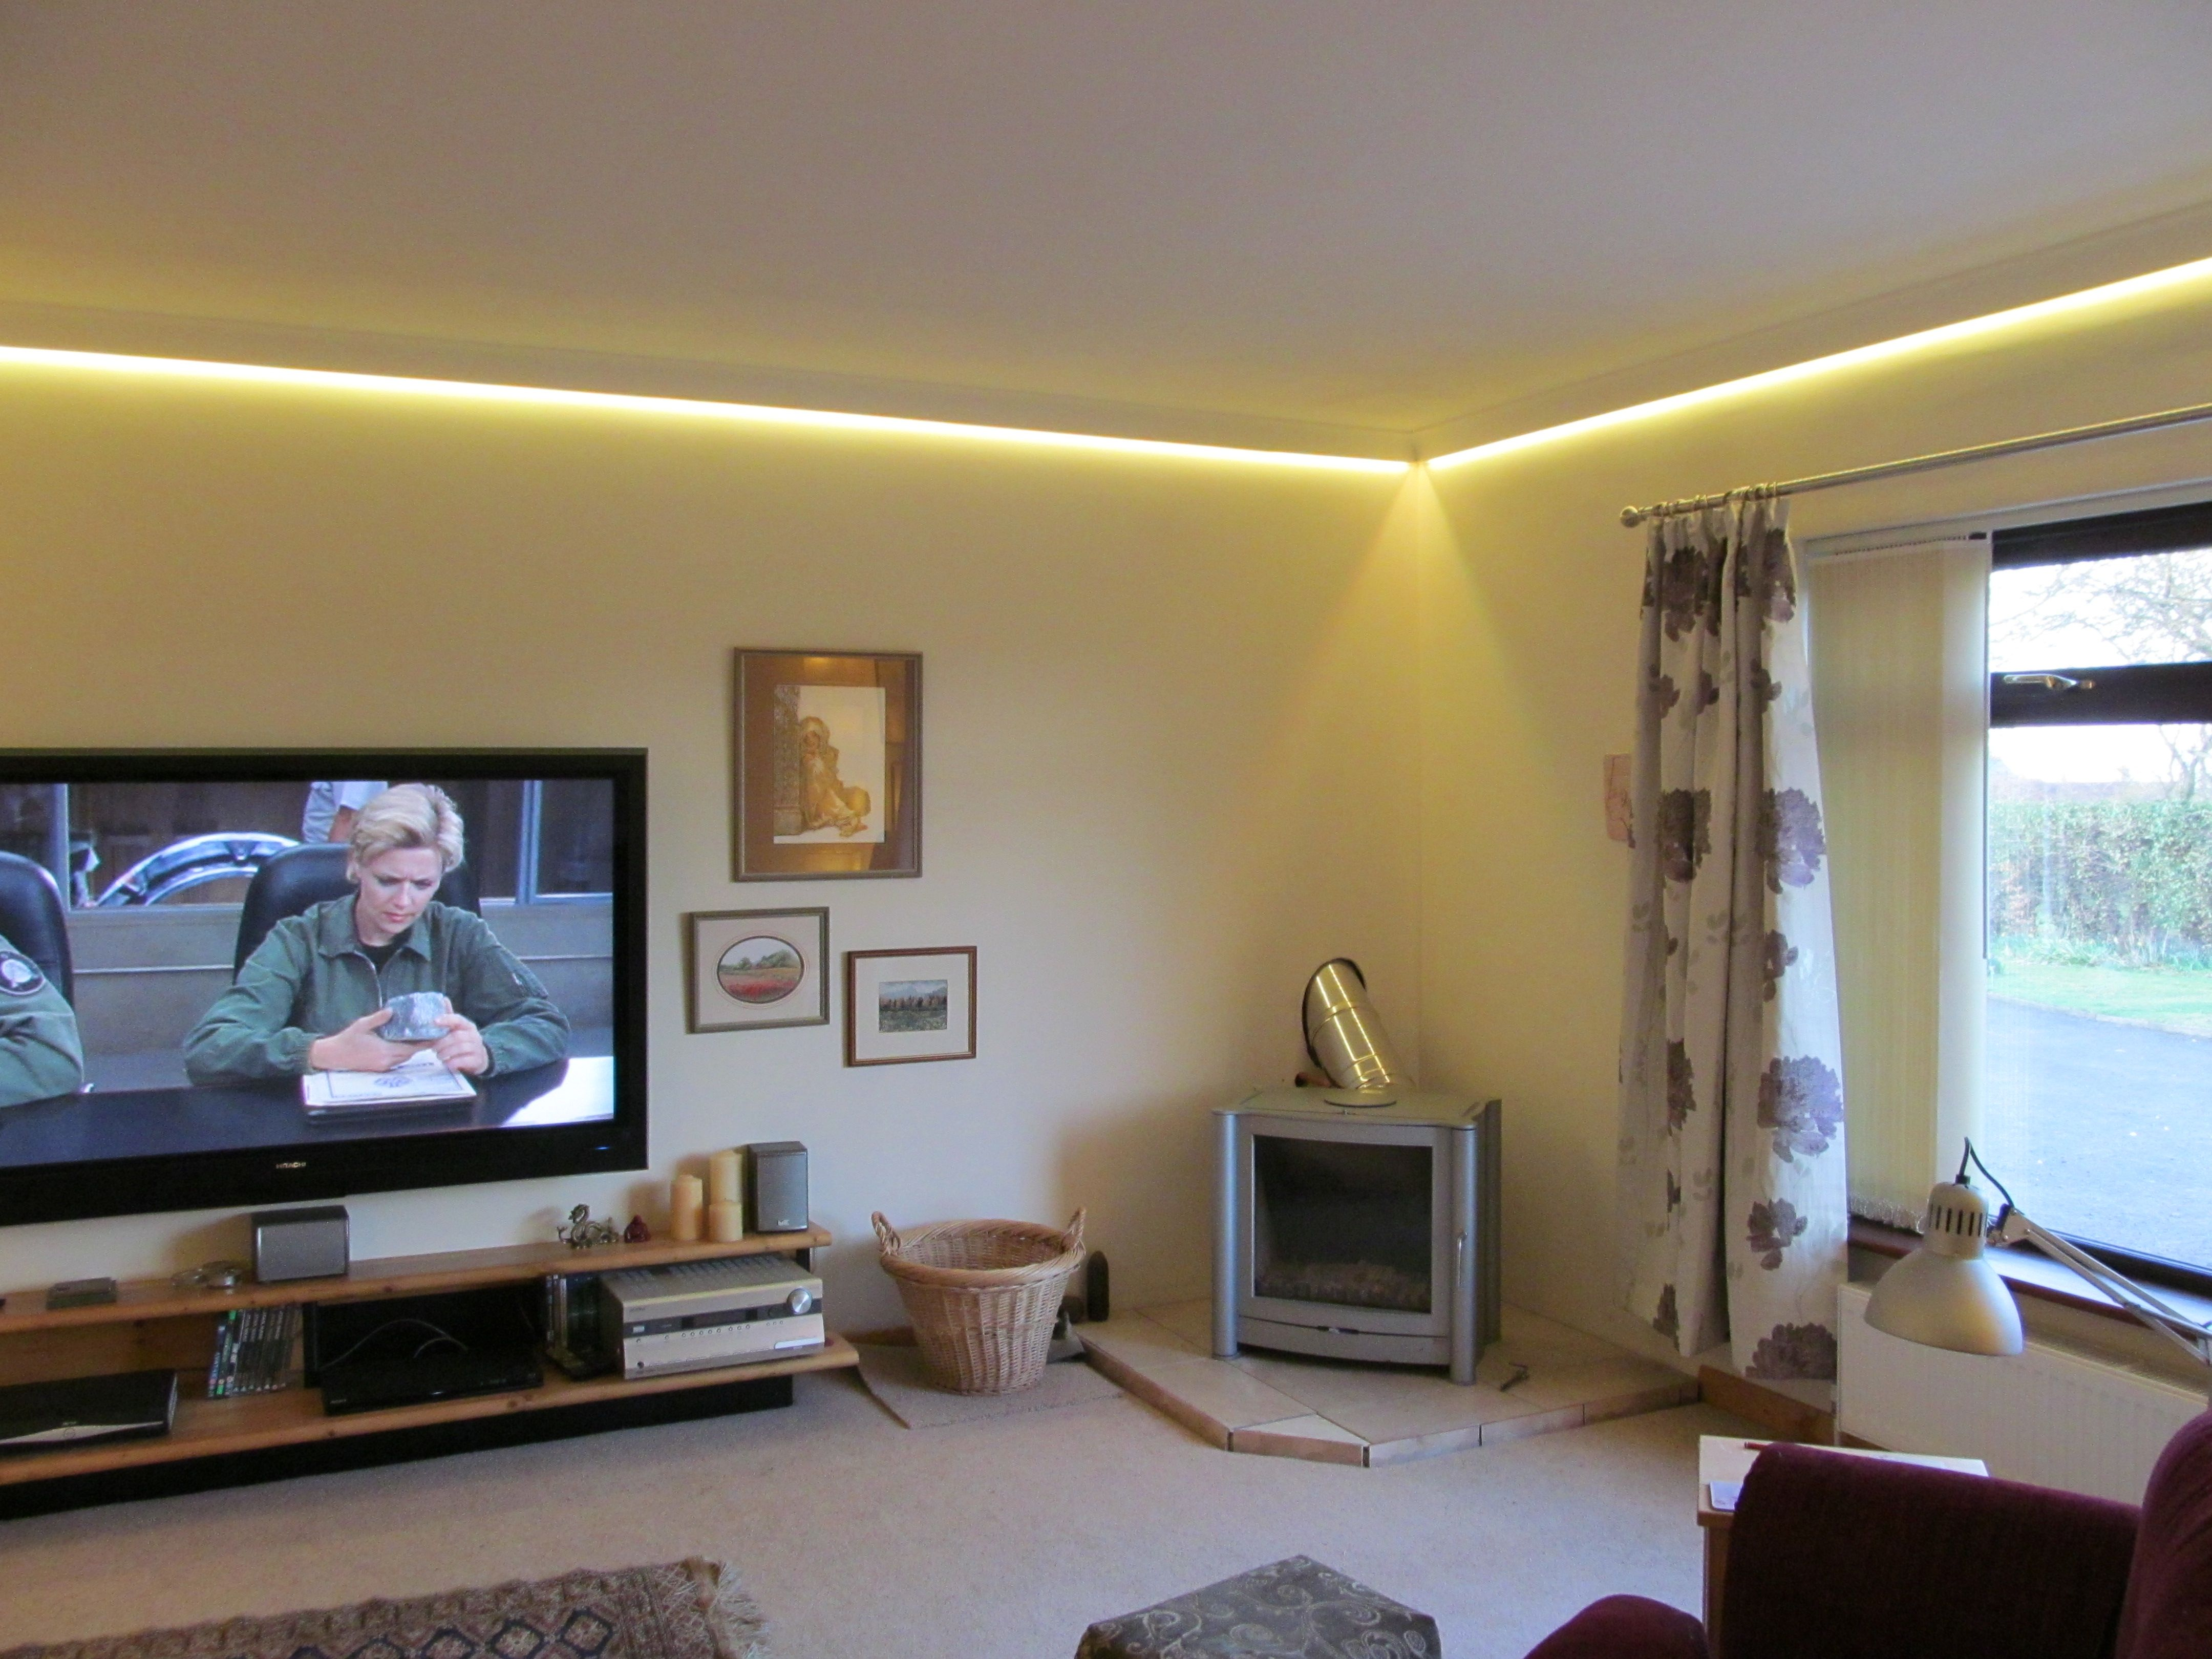 LED wall wash lighting Project - Plaster or Polystyrene coving ... for Led Lights For Bedroom Walls  183qdu